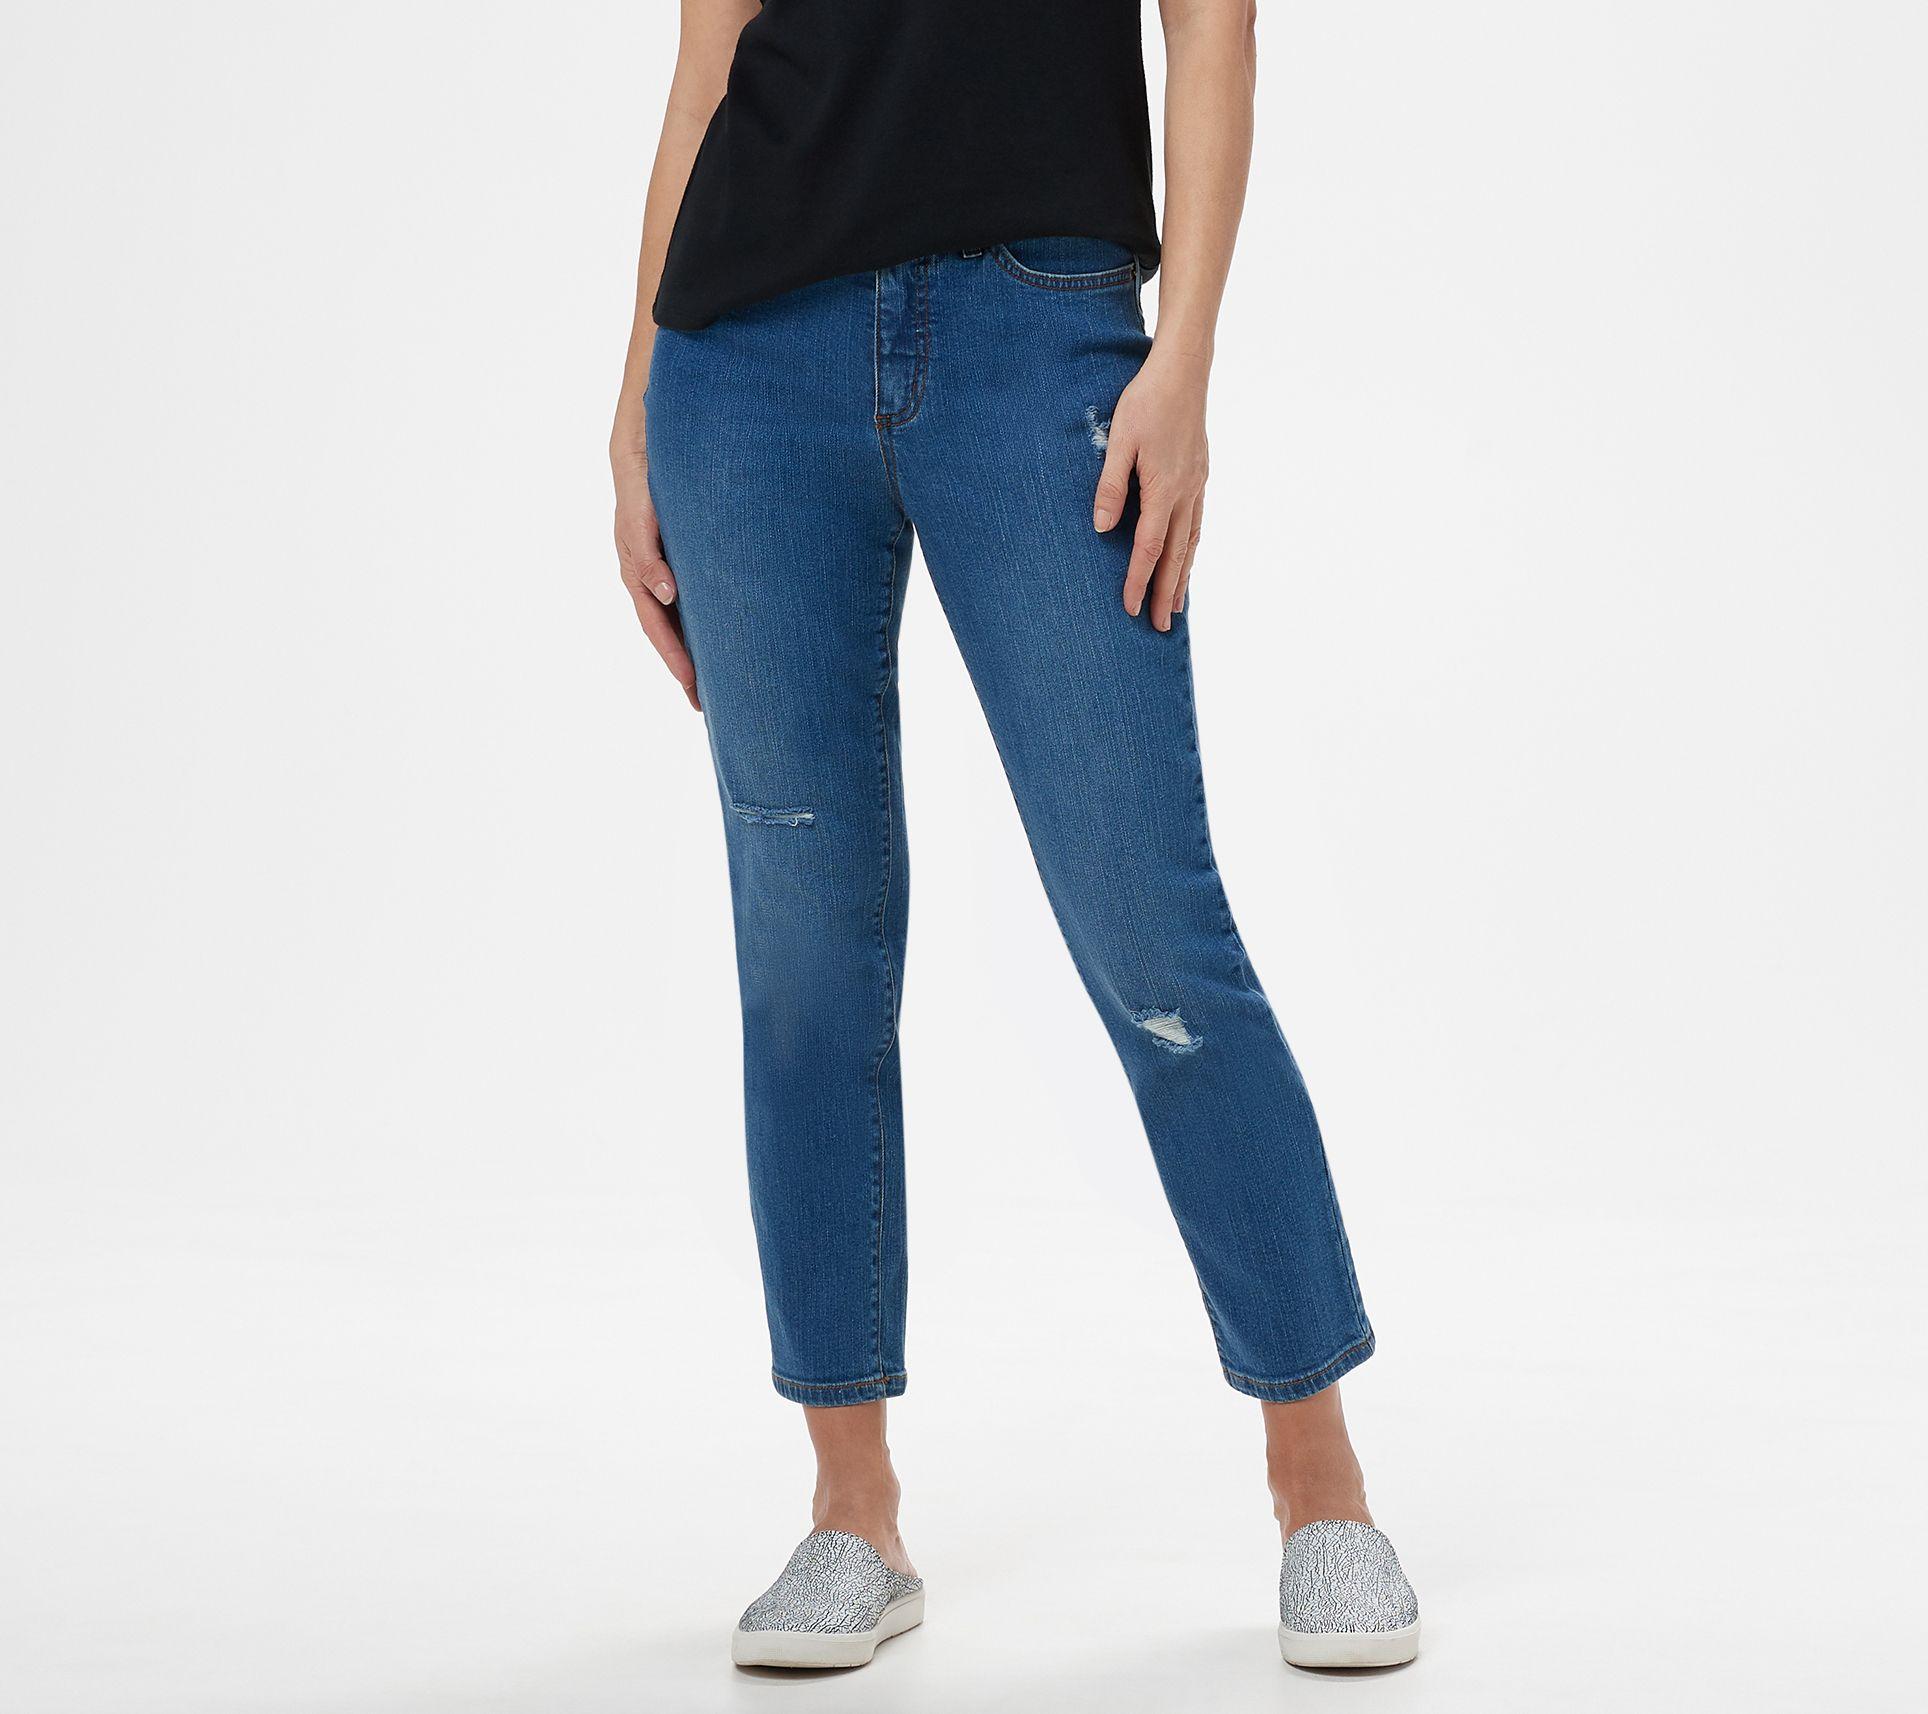 c42bc12d487 Studio by Denim   Co. Regular Classic Denim Ankle Jeans - Indigo ...